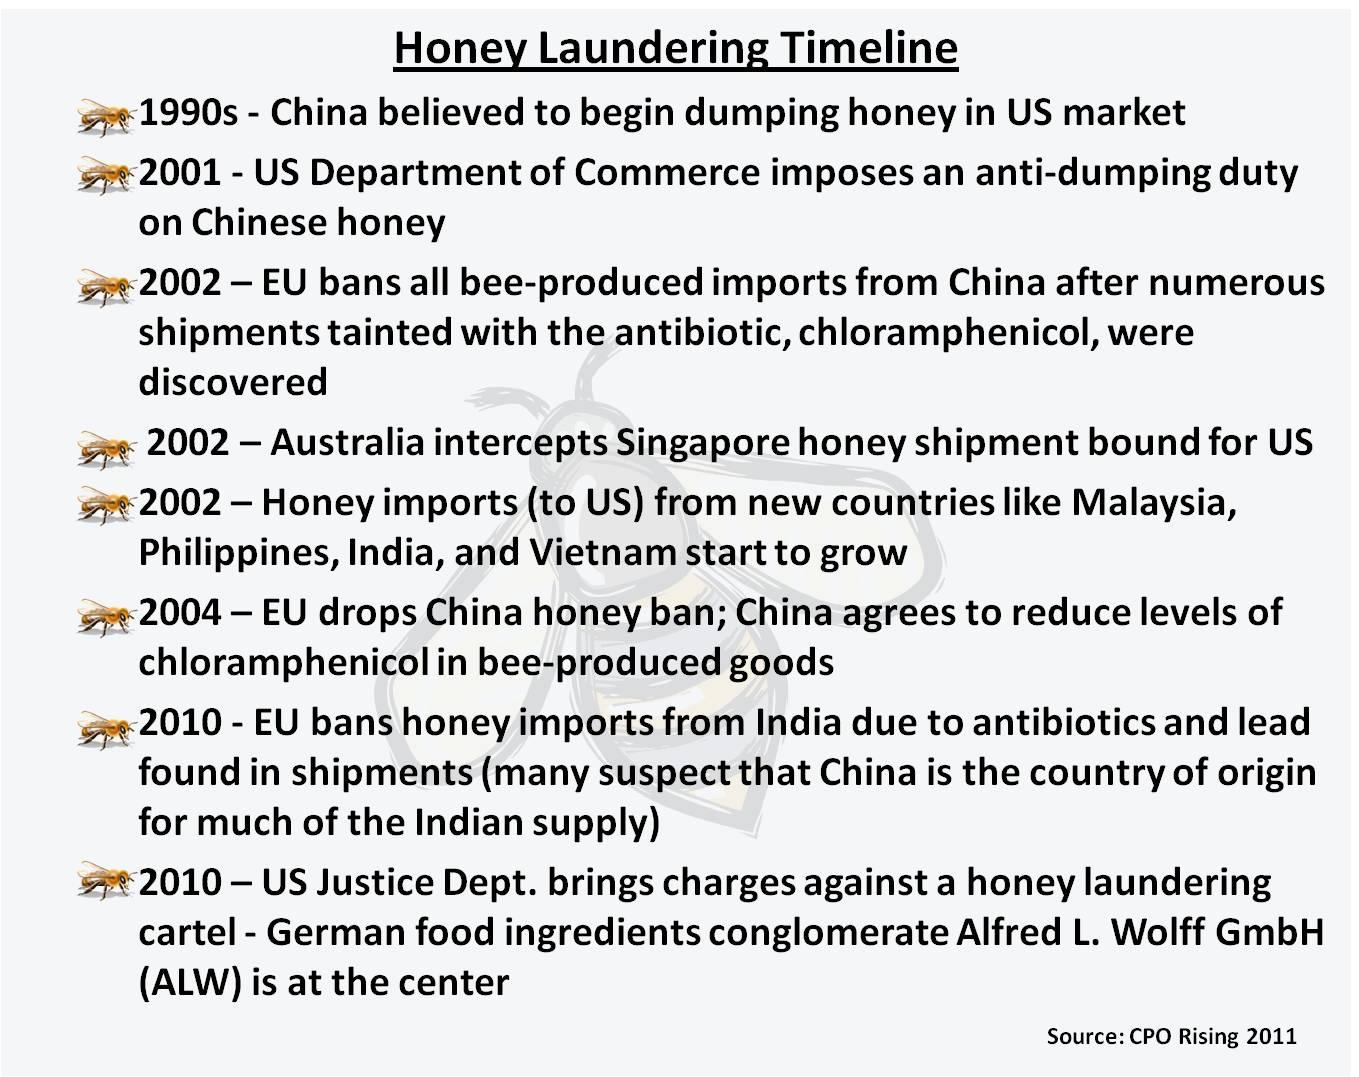 benefits of honey essay 3 teaspoons honey 6 benefits of healthy food essay ounces crumbled feta ¼ cup basil, sliced instructions preheat oven to 400 degrees.